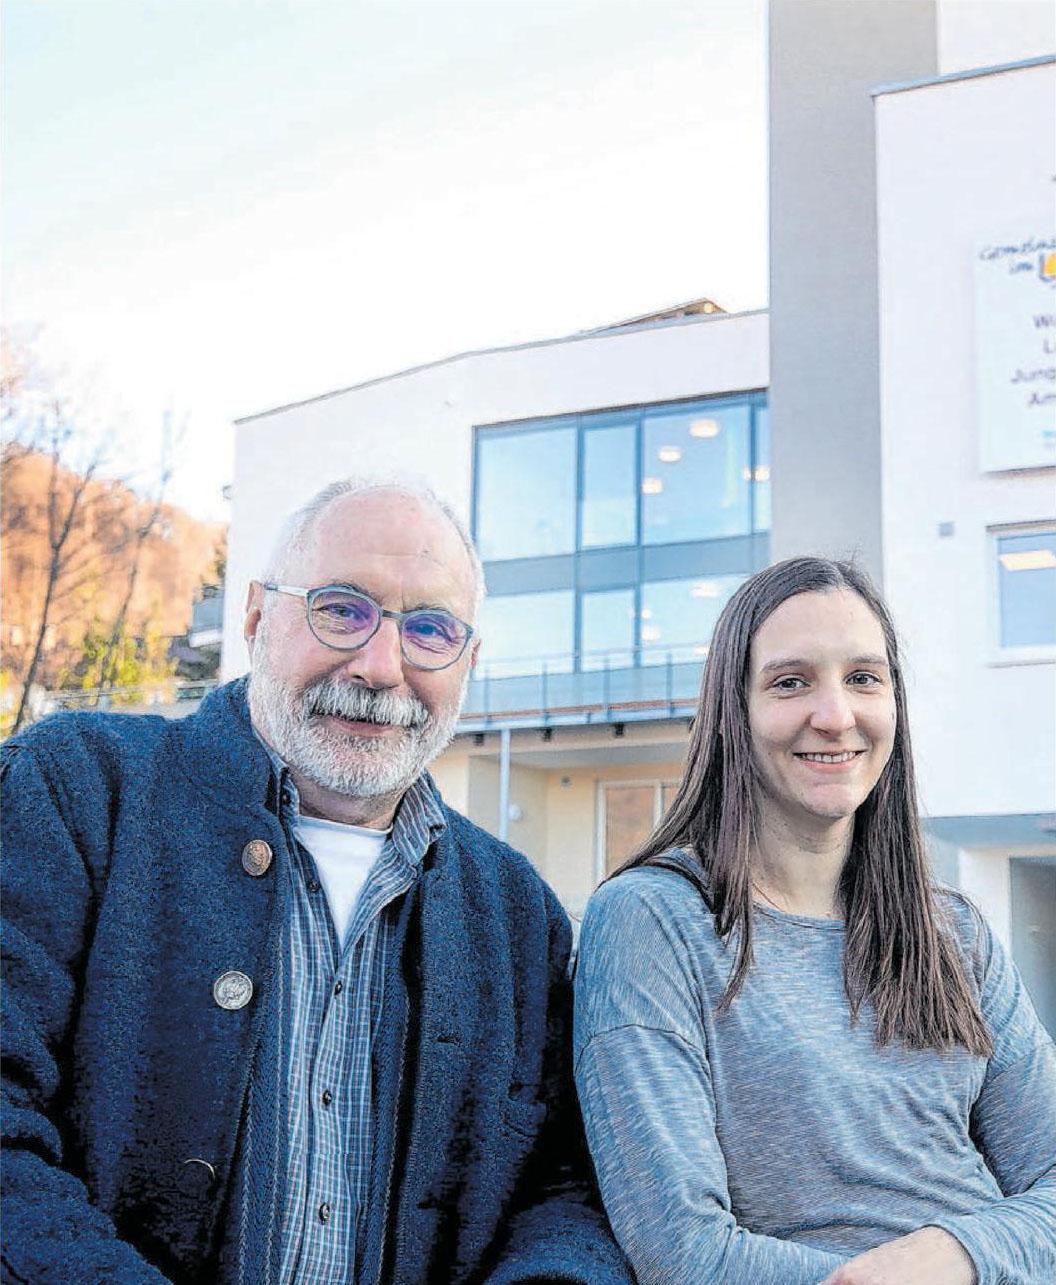 Änderungen zum Neustart: Tochter Tabea Budweg übernahm die Heimleitung, Wolfgang Budweg bleibt aber Geschäftsführer.